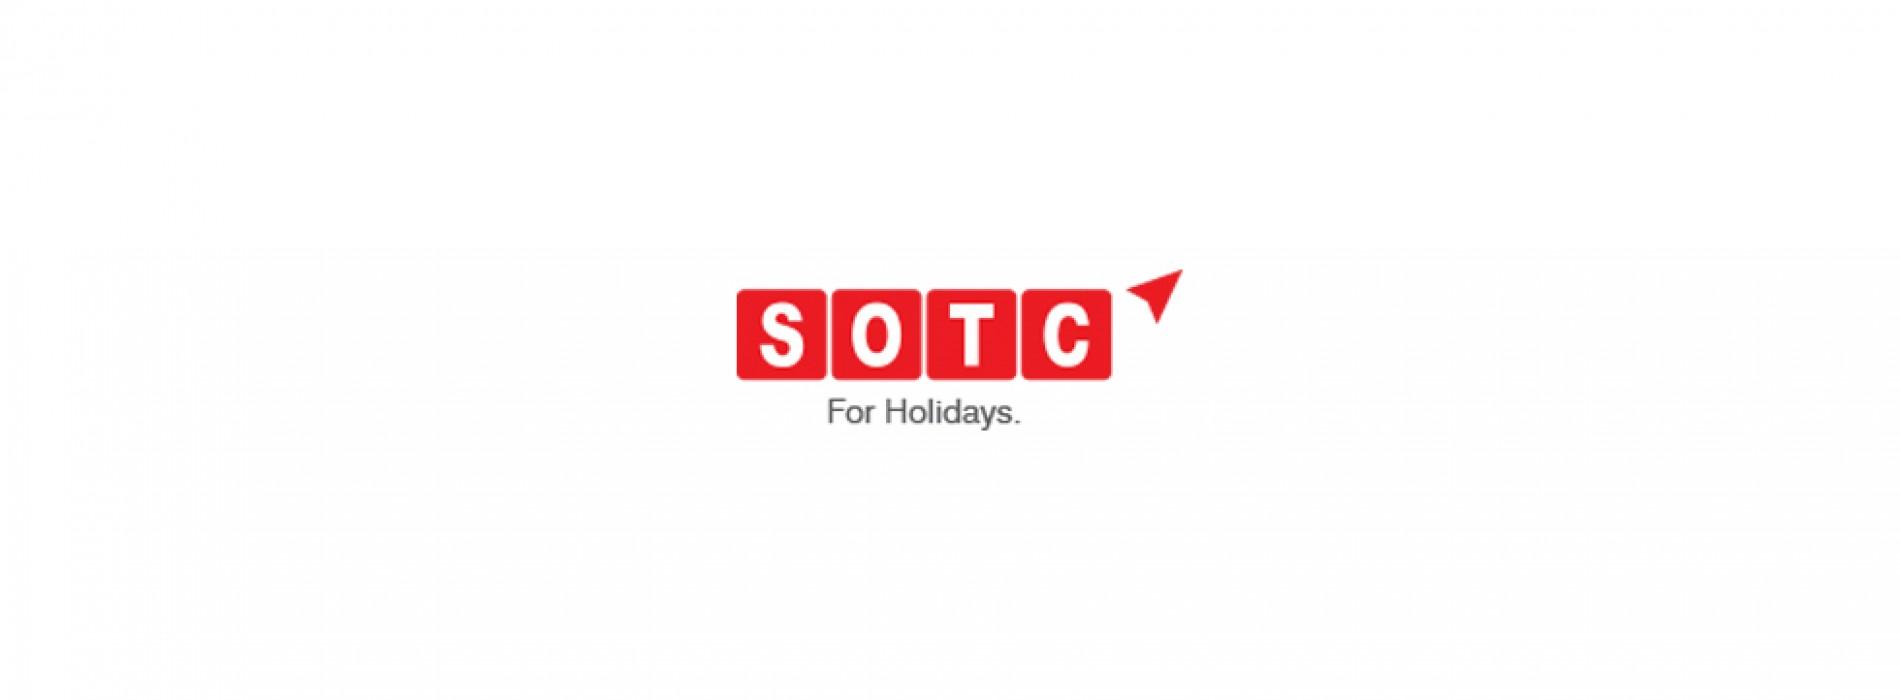 SOTC launches its first ever Signature Store at New Delhi